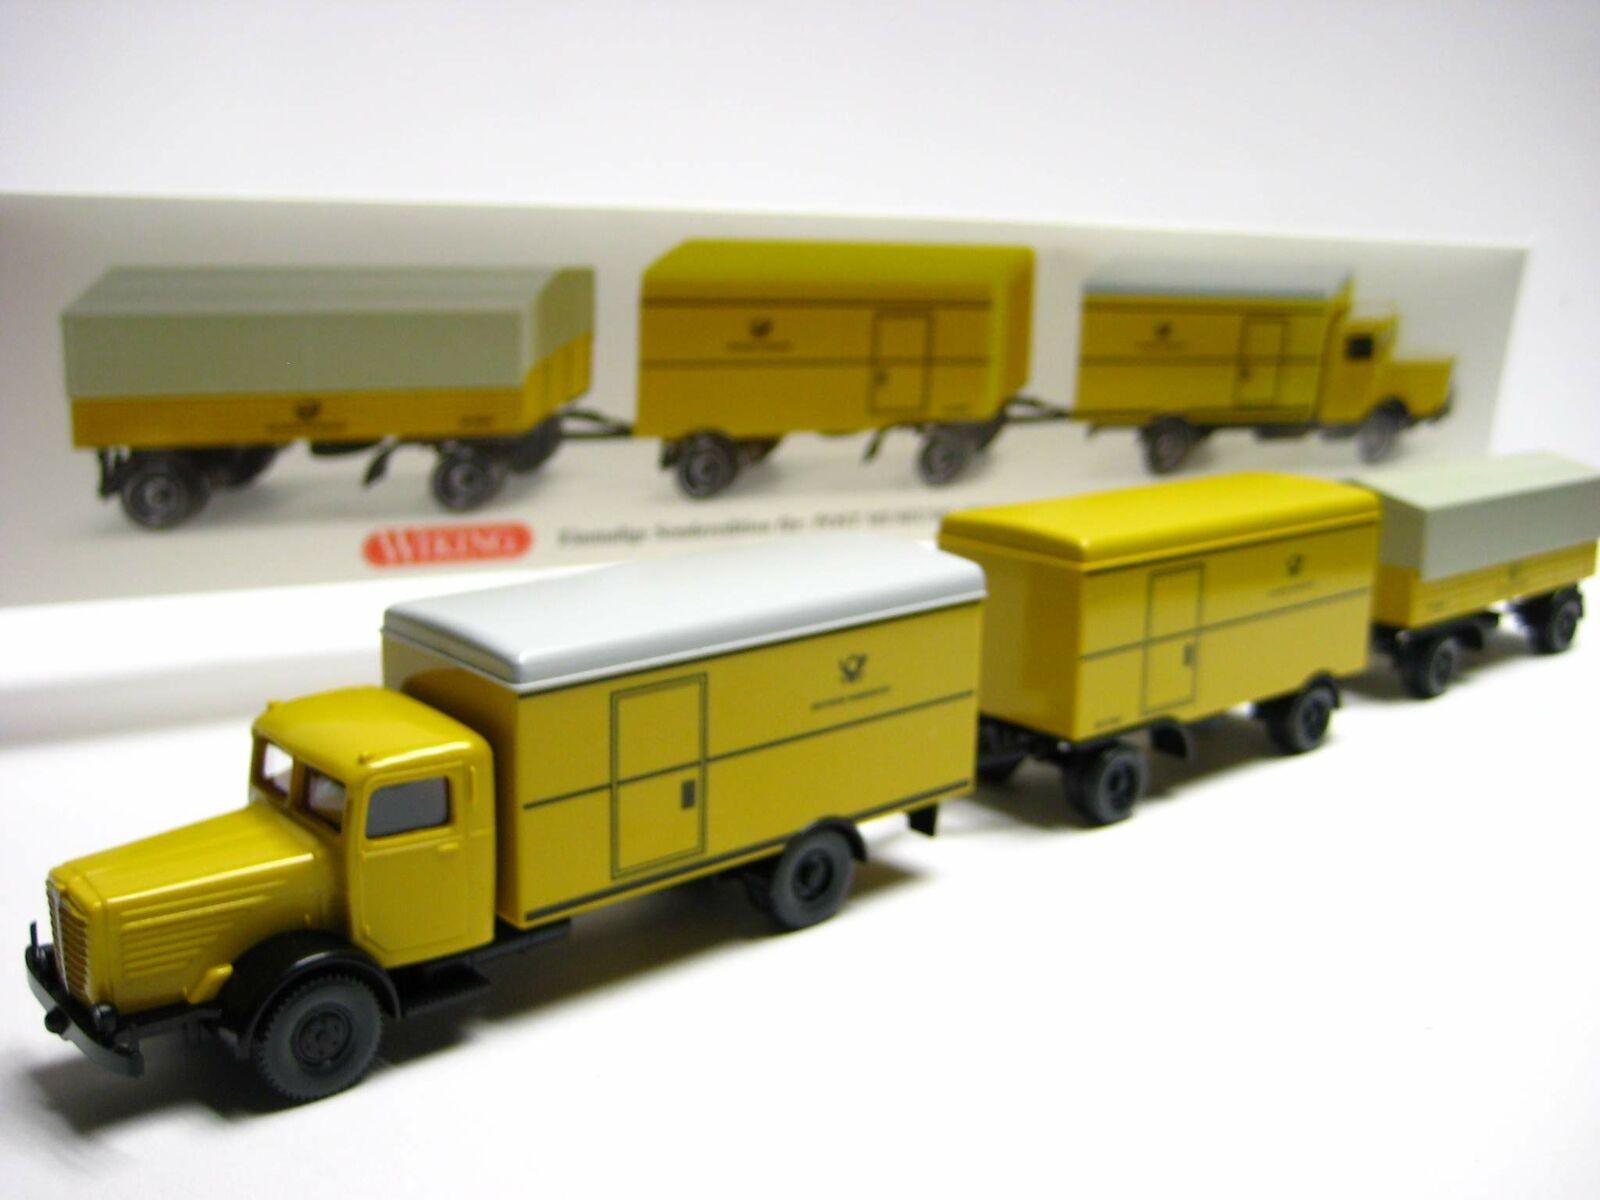 Wiking Post PMS 82-21 Büssing 8000 - Post - Paket-Lastzug 3tlg.